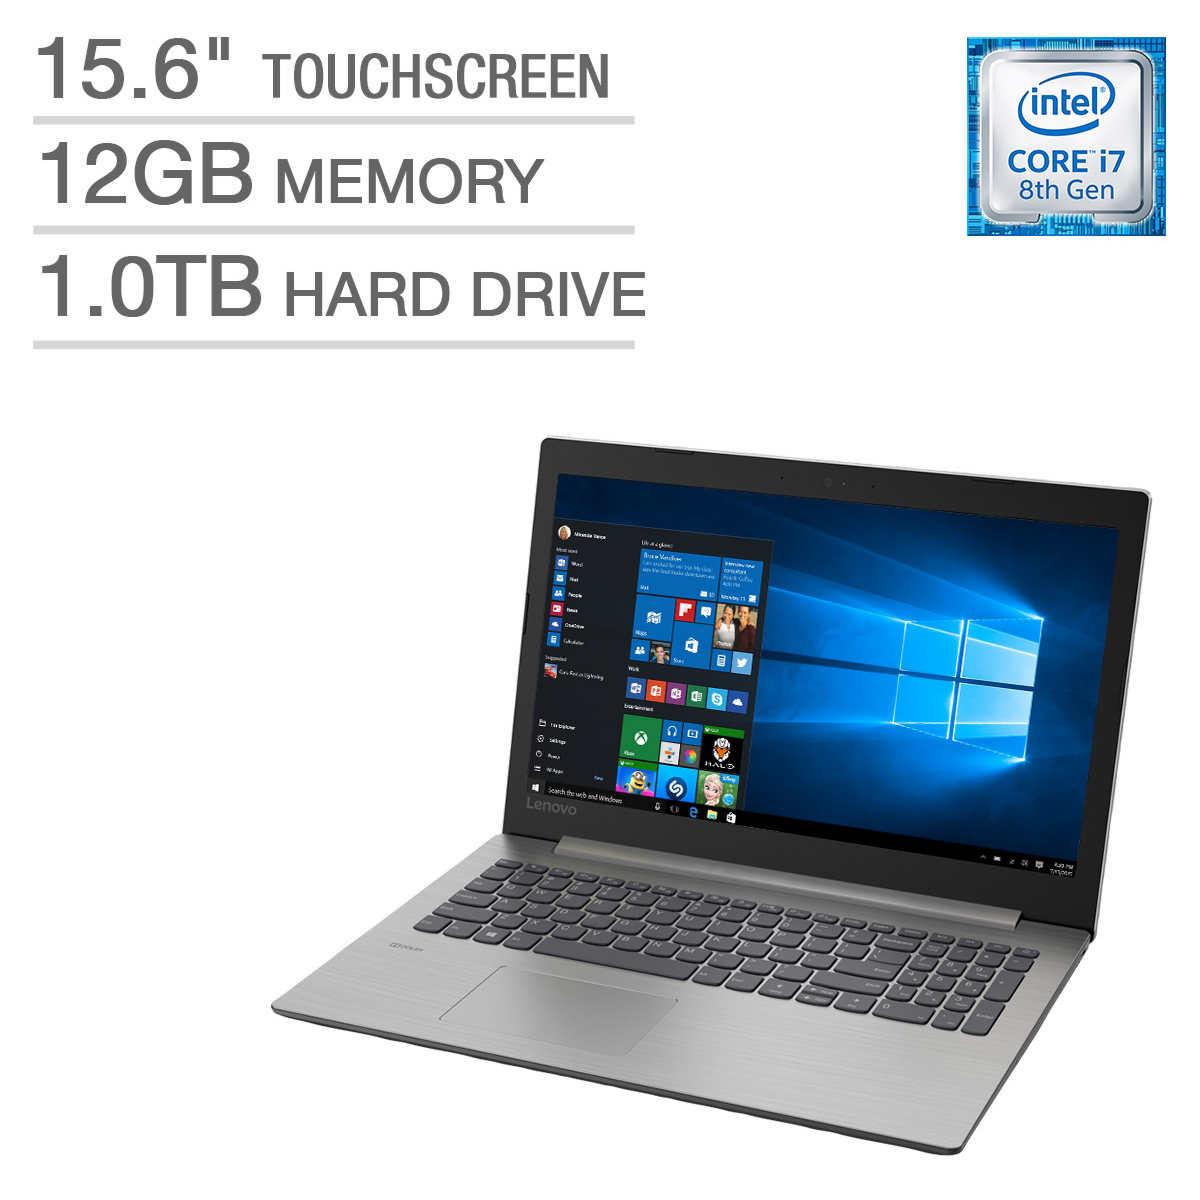 Lenovo Ideapad 330 15 Touchscreen Laptop - Intel Core i7